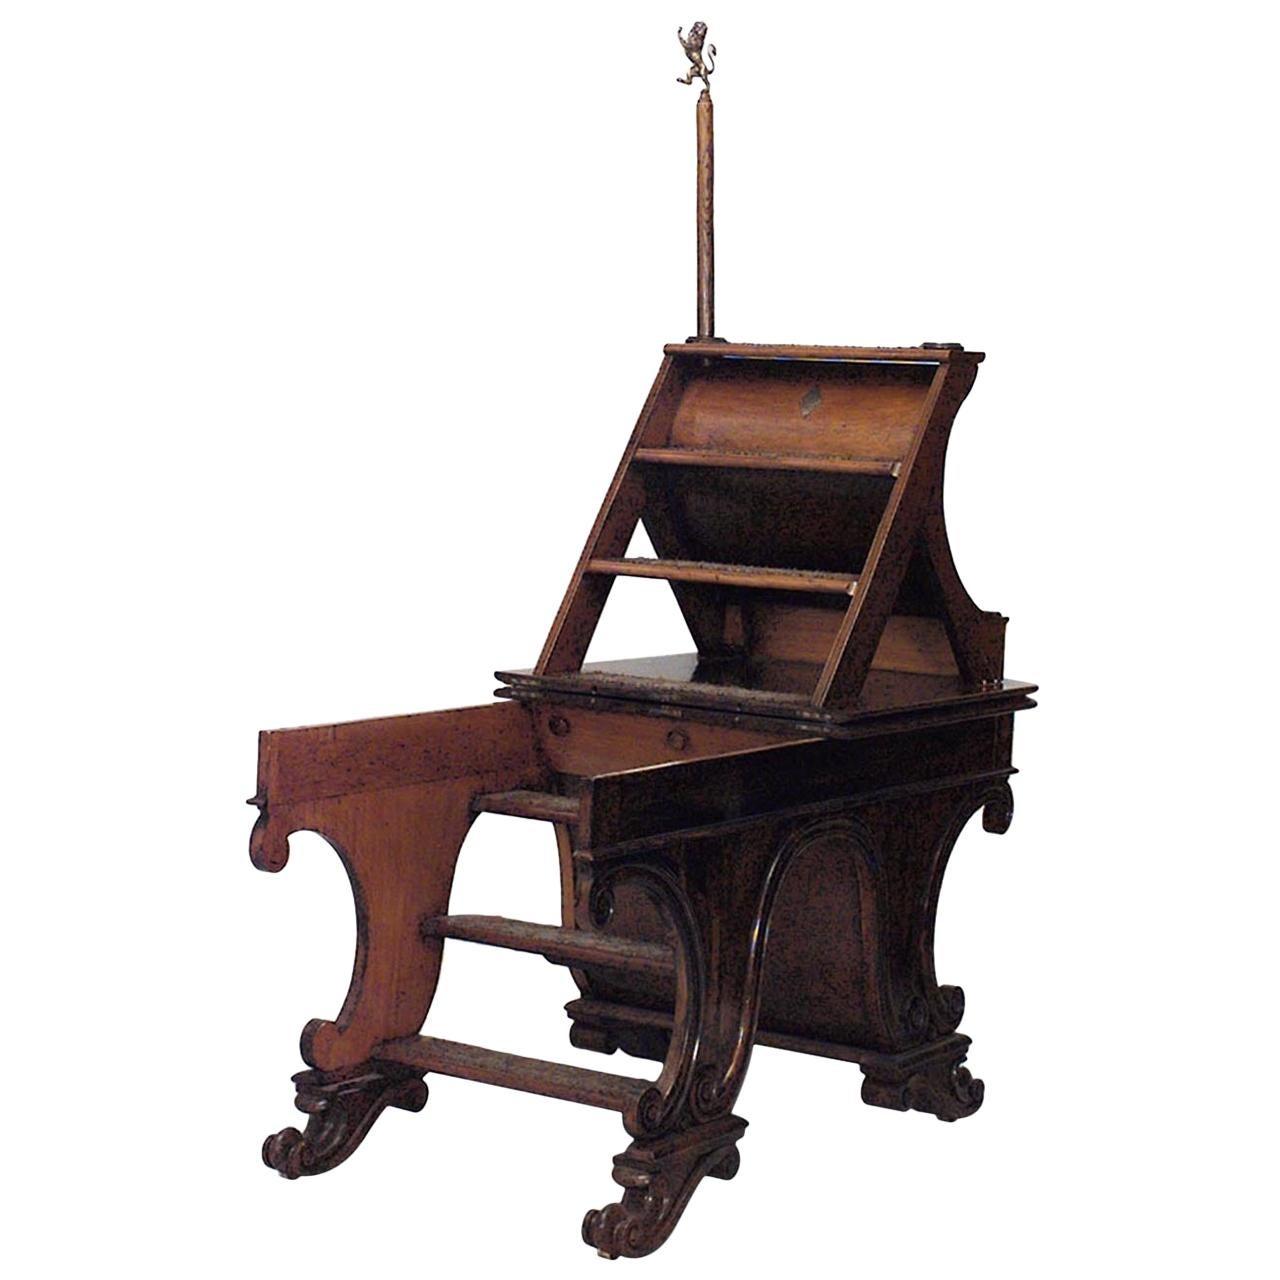 English Regency Metamorphic Library Ladder